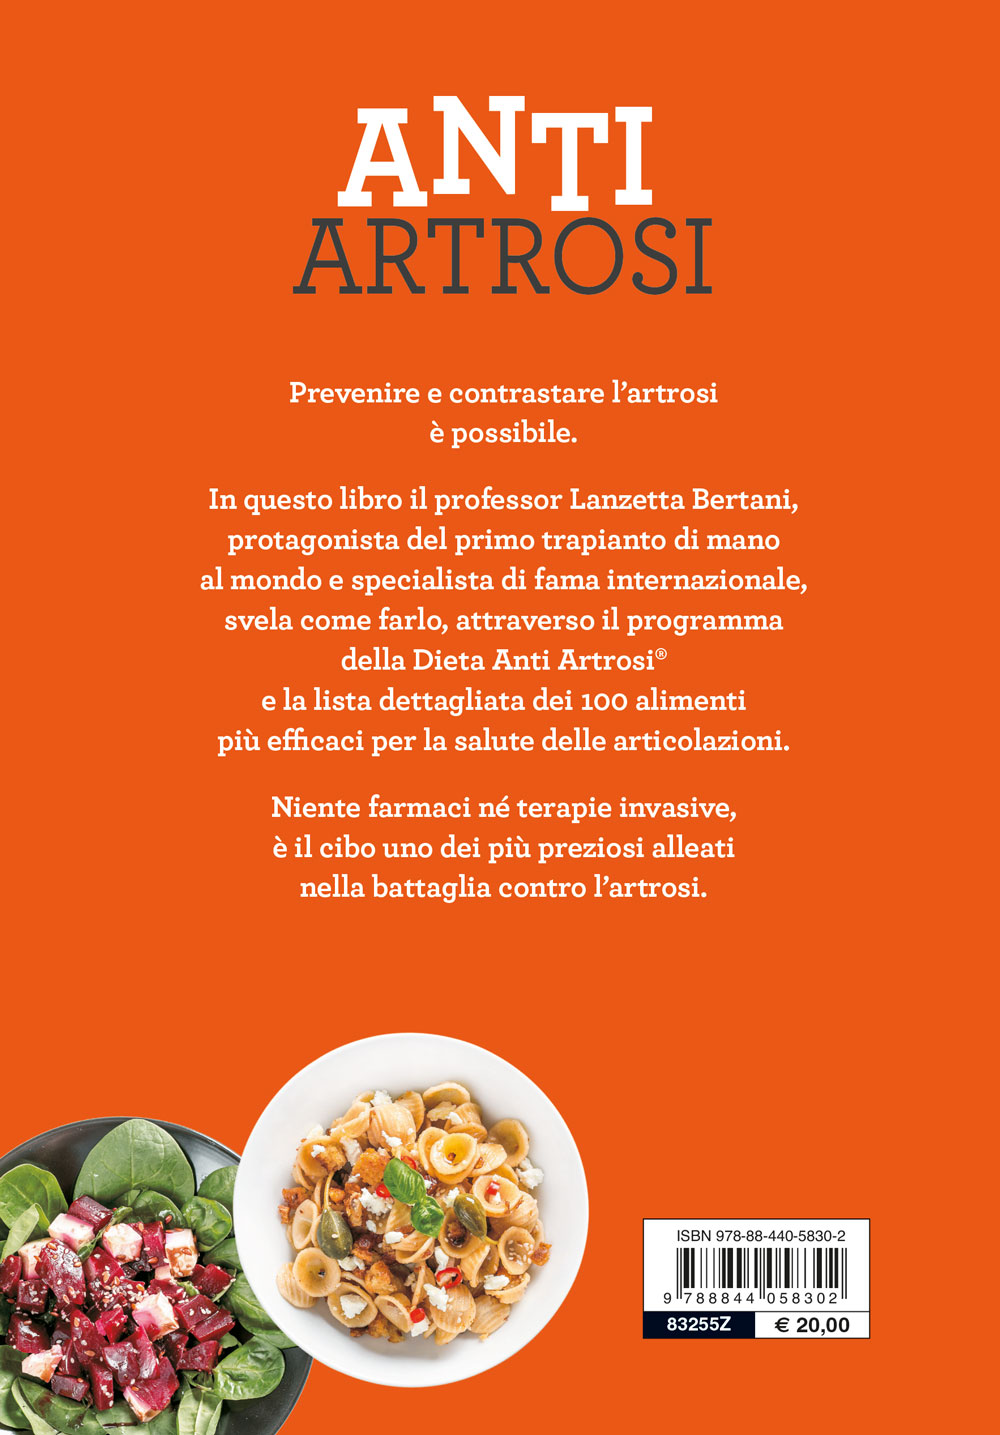 Anti Artrosi